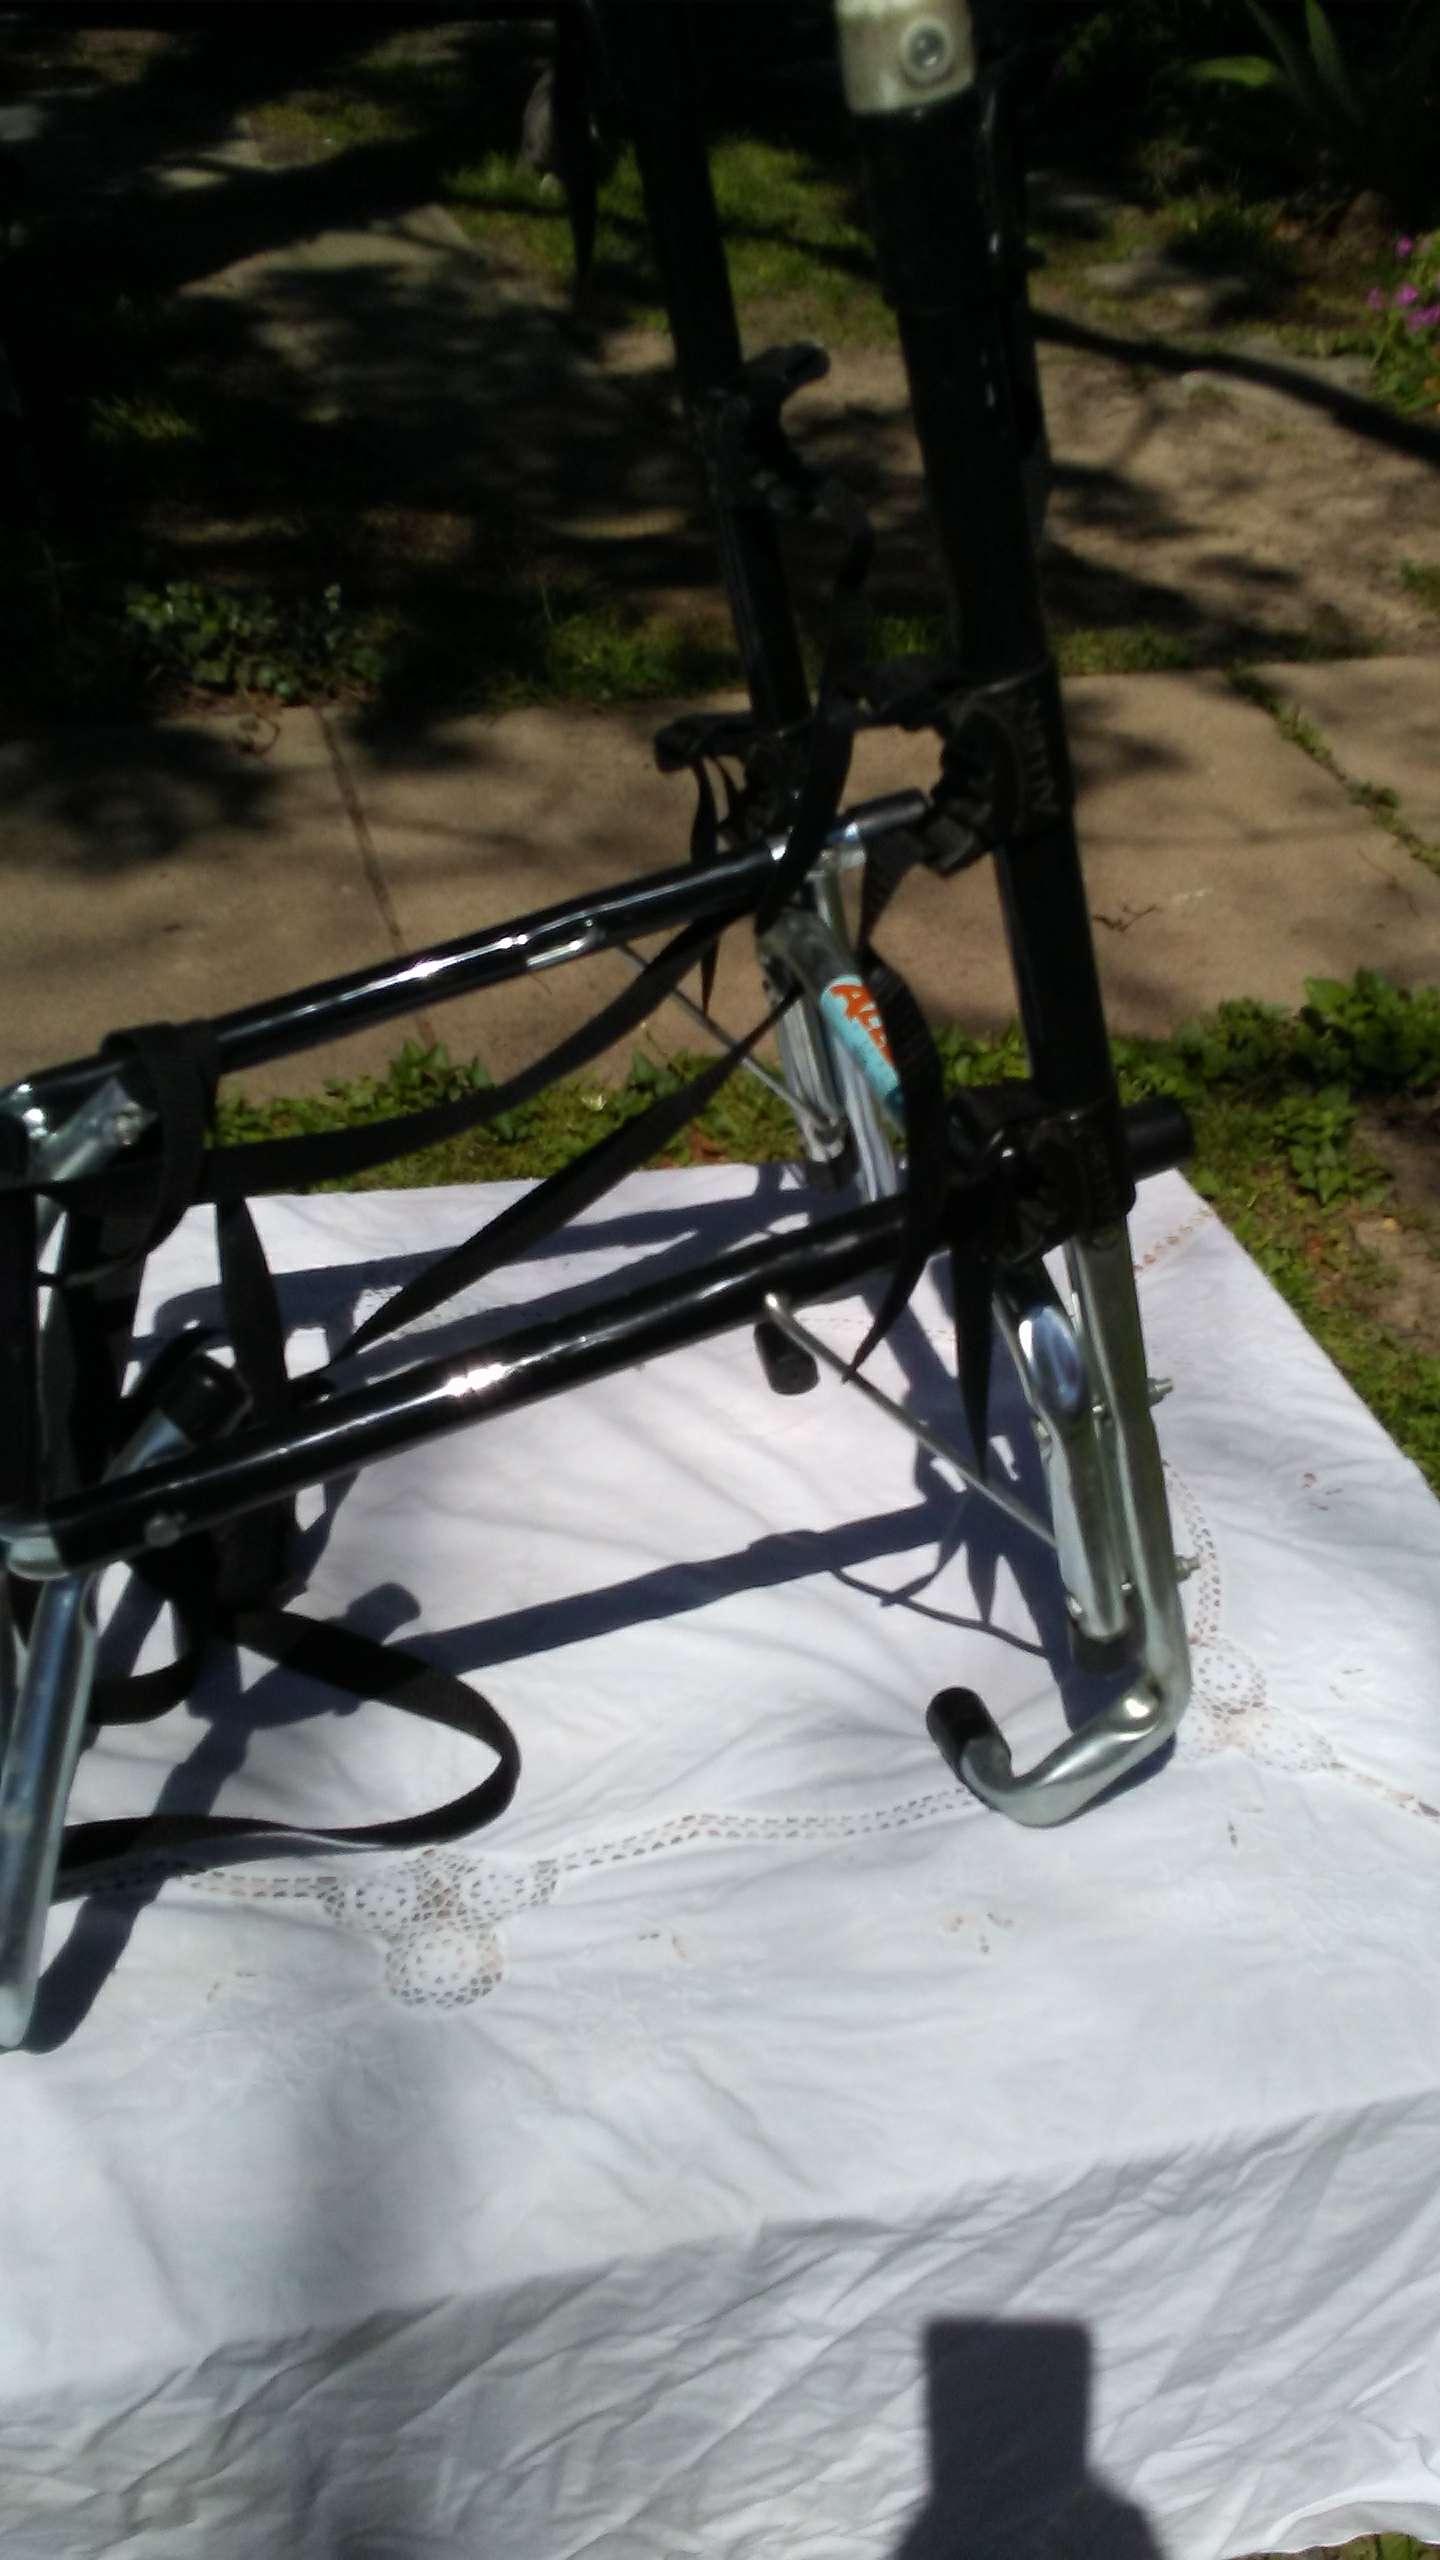 Photo Allen 303D 3-bike spare tire mount rack Jeep SUV NICE!